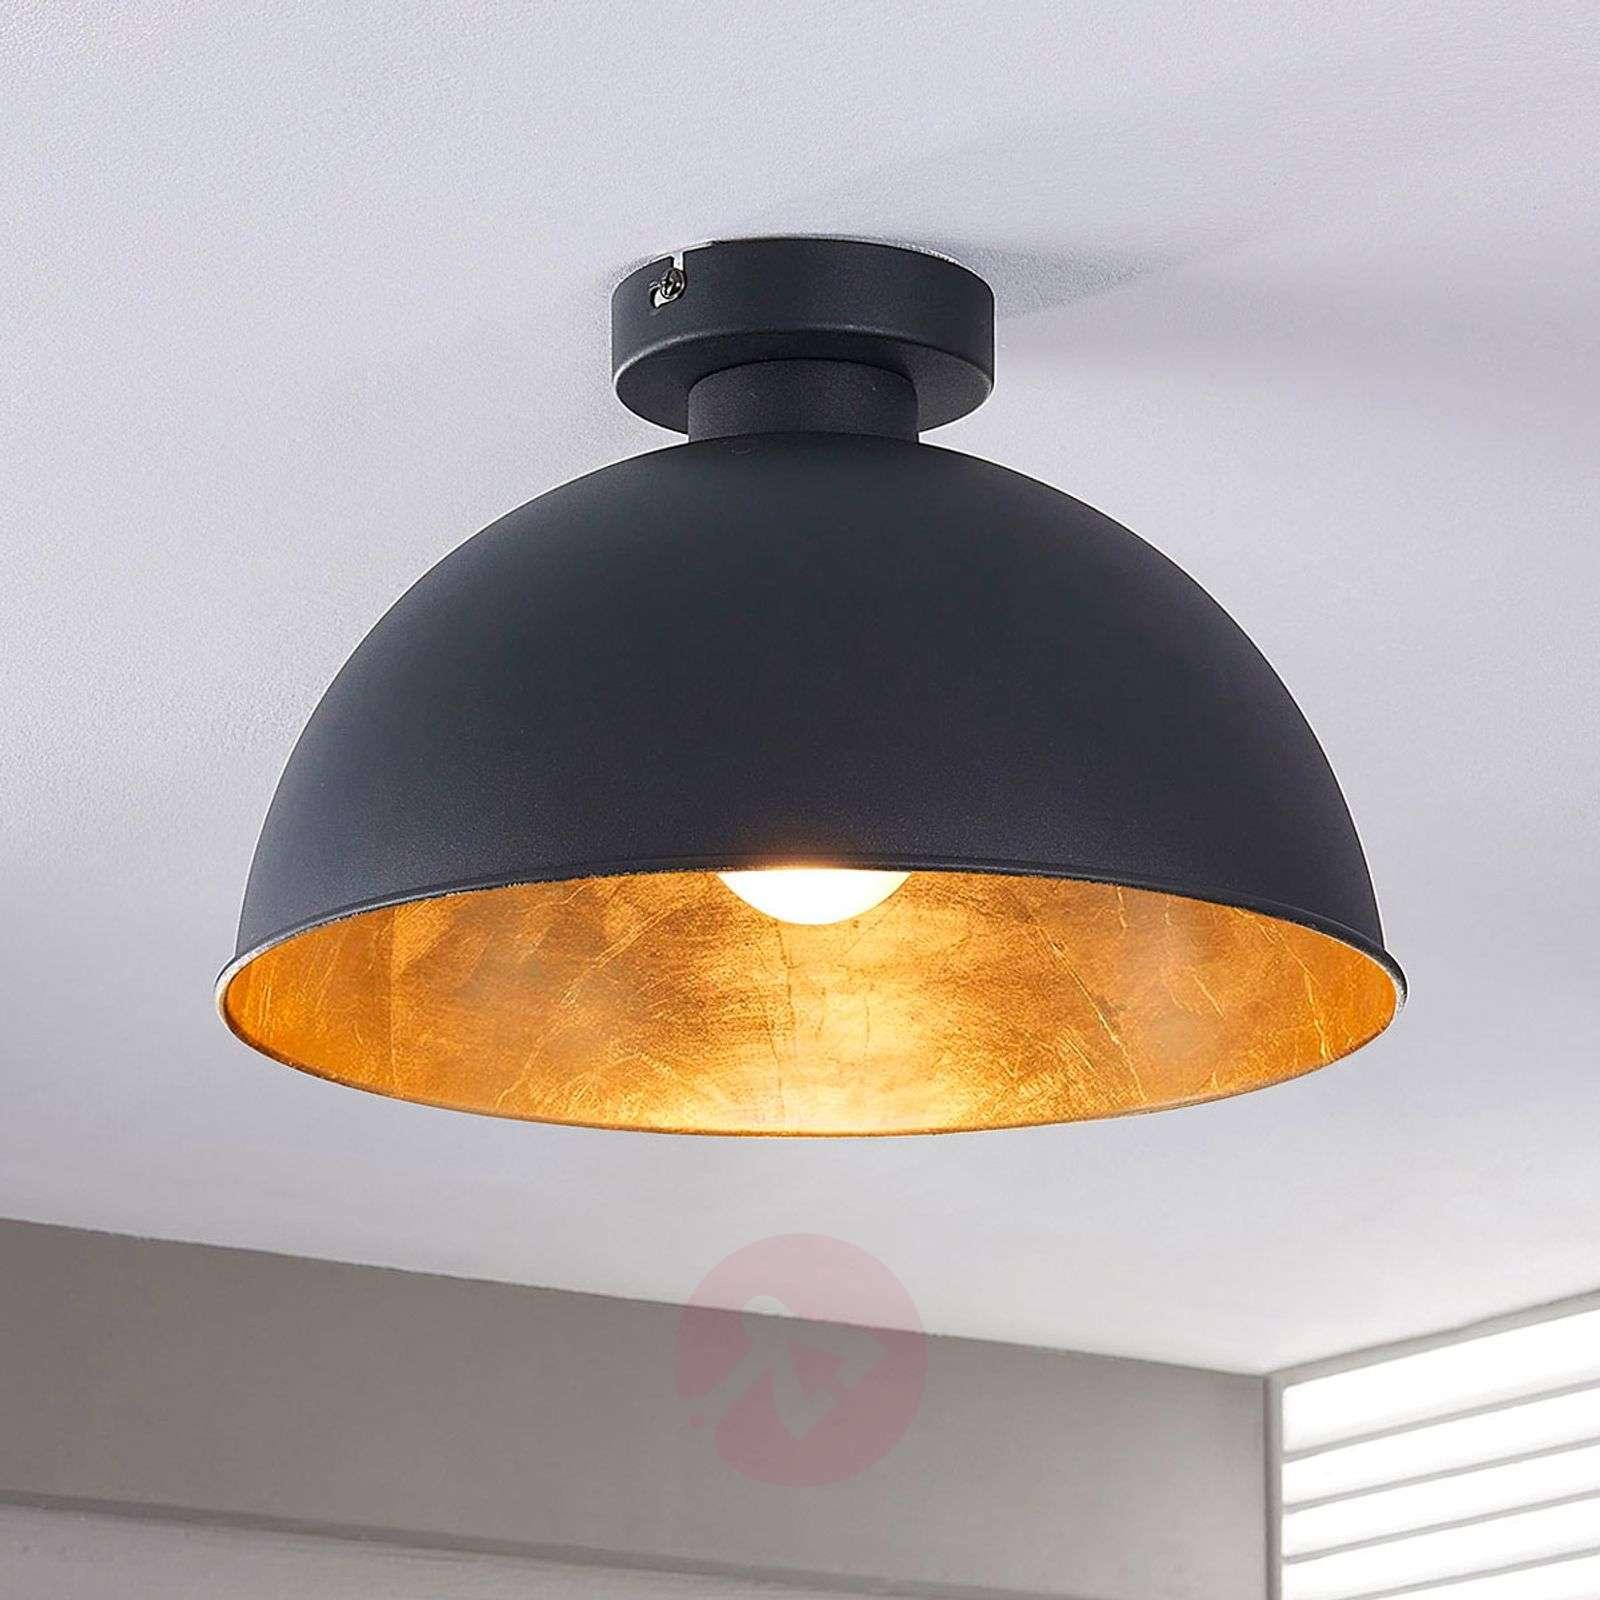 Black and gold ceiling light Lya-9620829-02